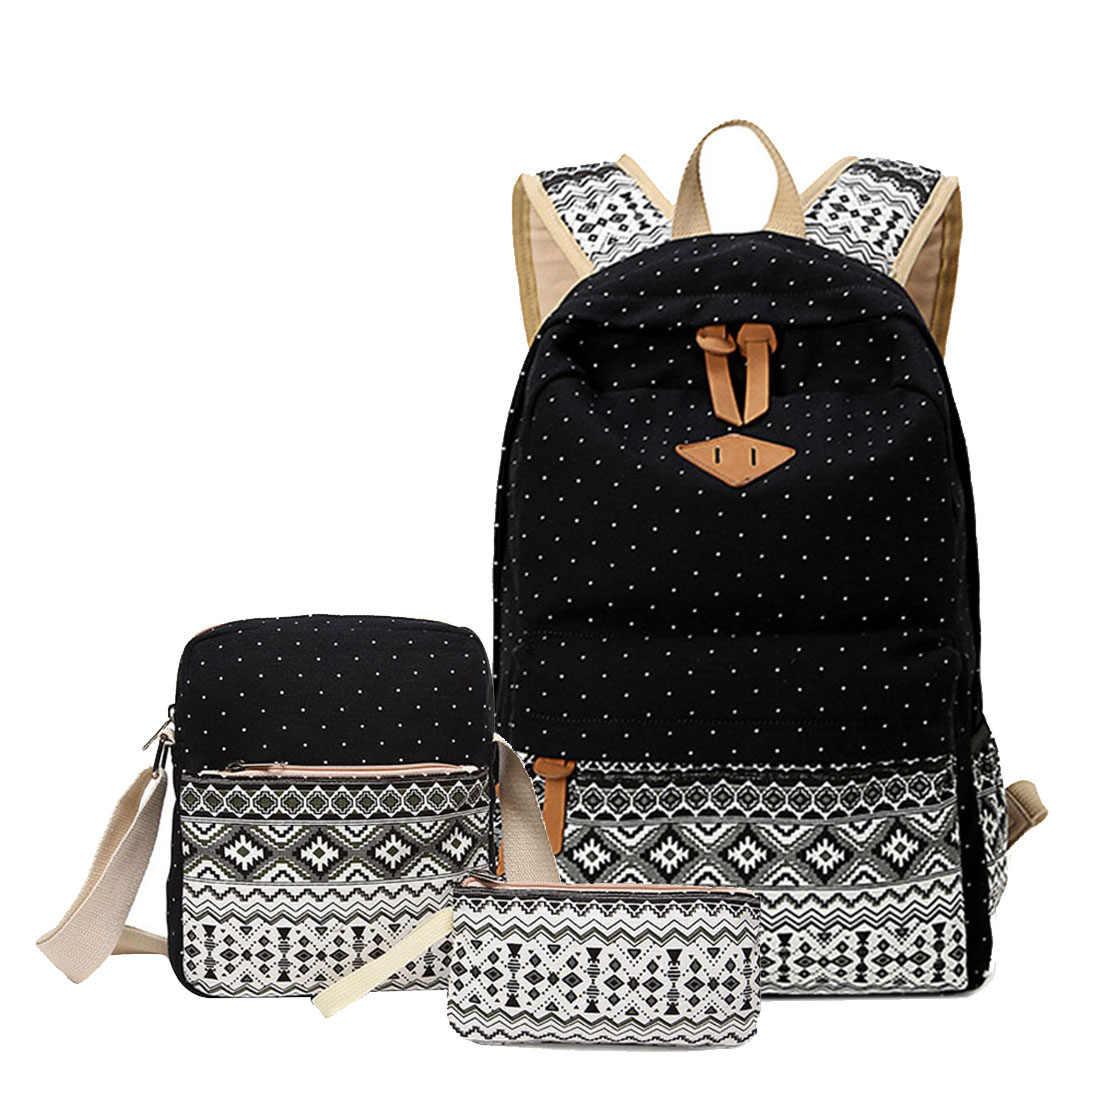 3 Pcs Set Polka Dot Printing Women Backpack Cute Lightweight